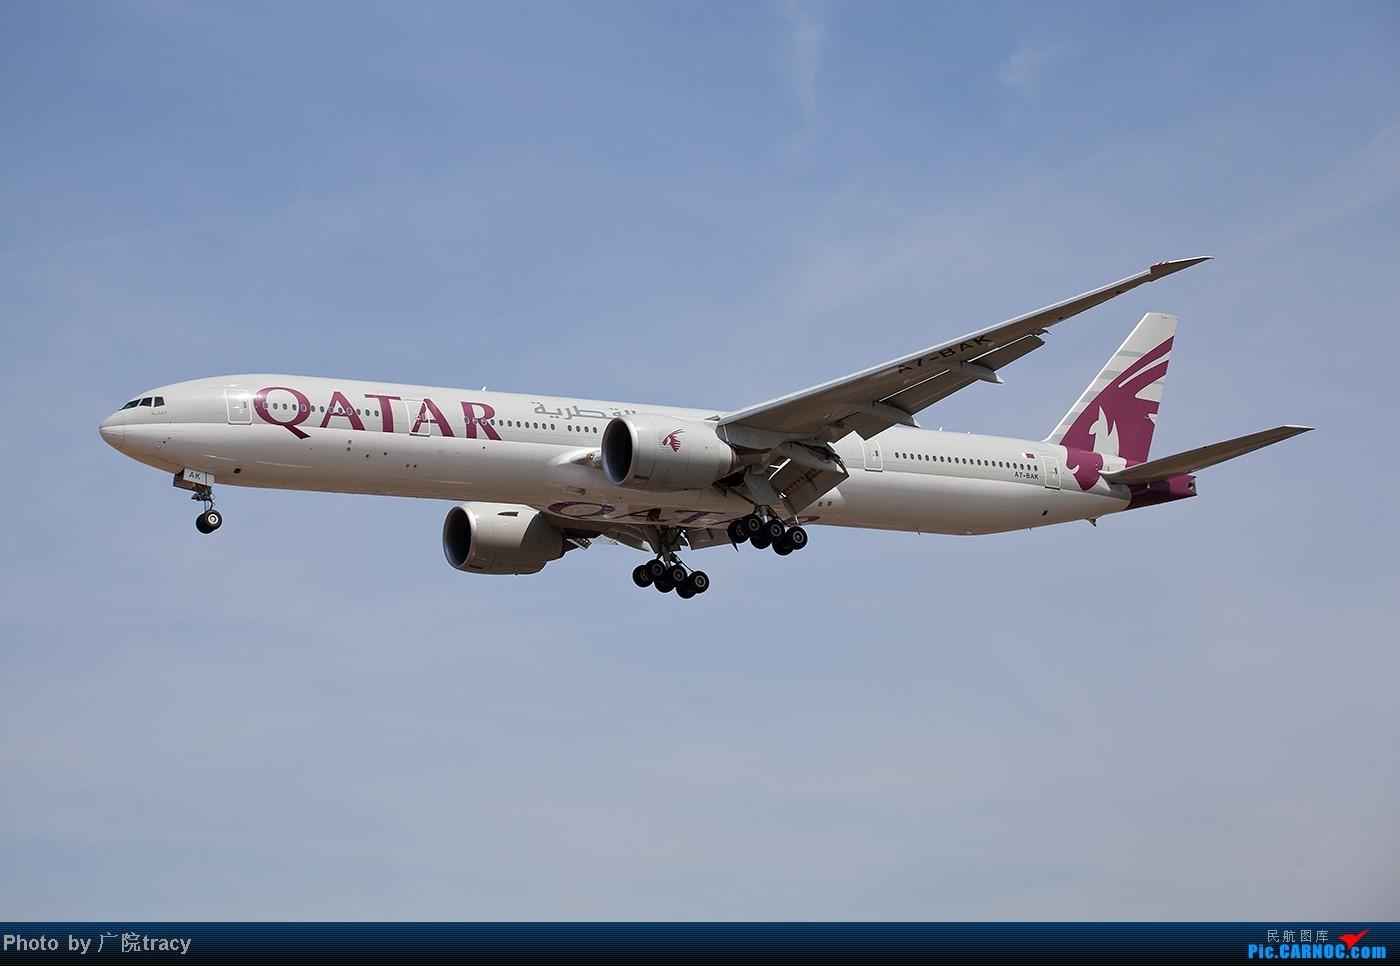 Re:[原创]★ ★ ★ ★ ★中东的航空公司在伦敦希斯罗国际机场  ★ ★ ★ ★ ★ BOEING 777-300ER A7-BAK 英国伦敦希思罗机场